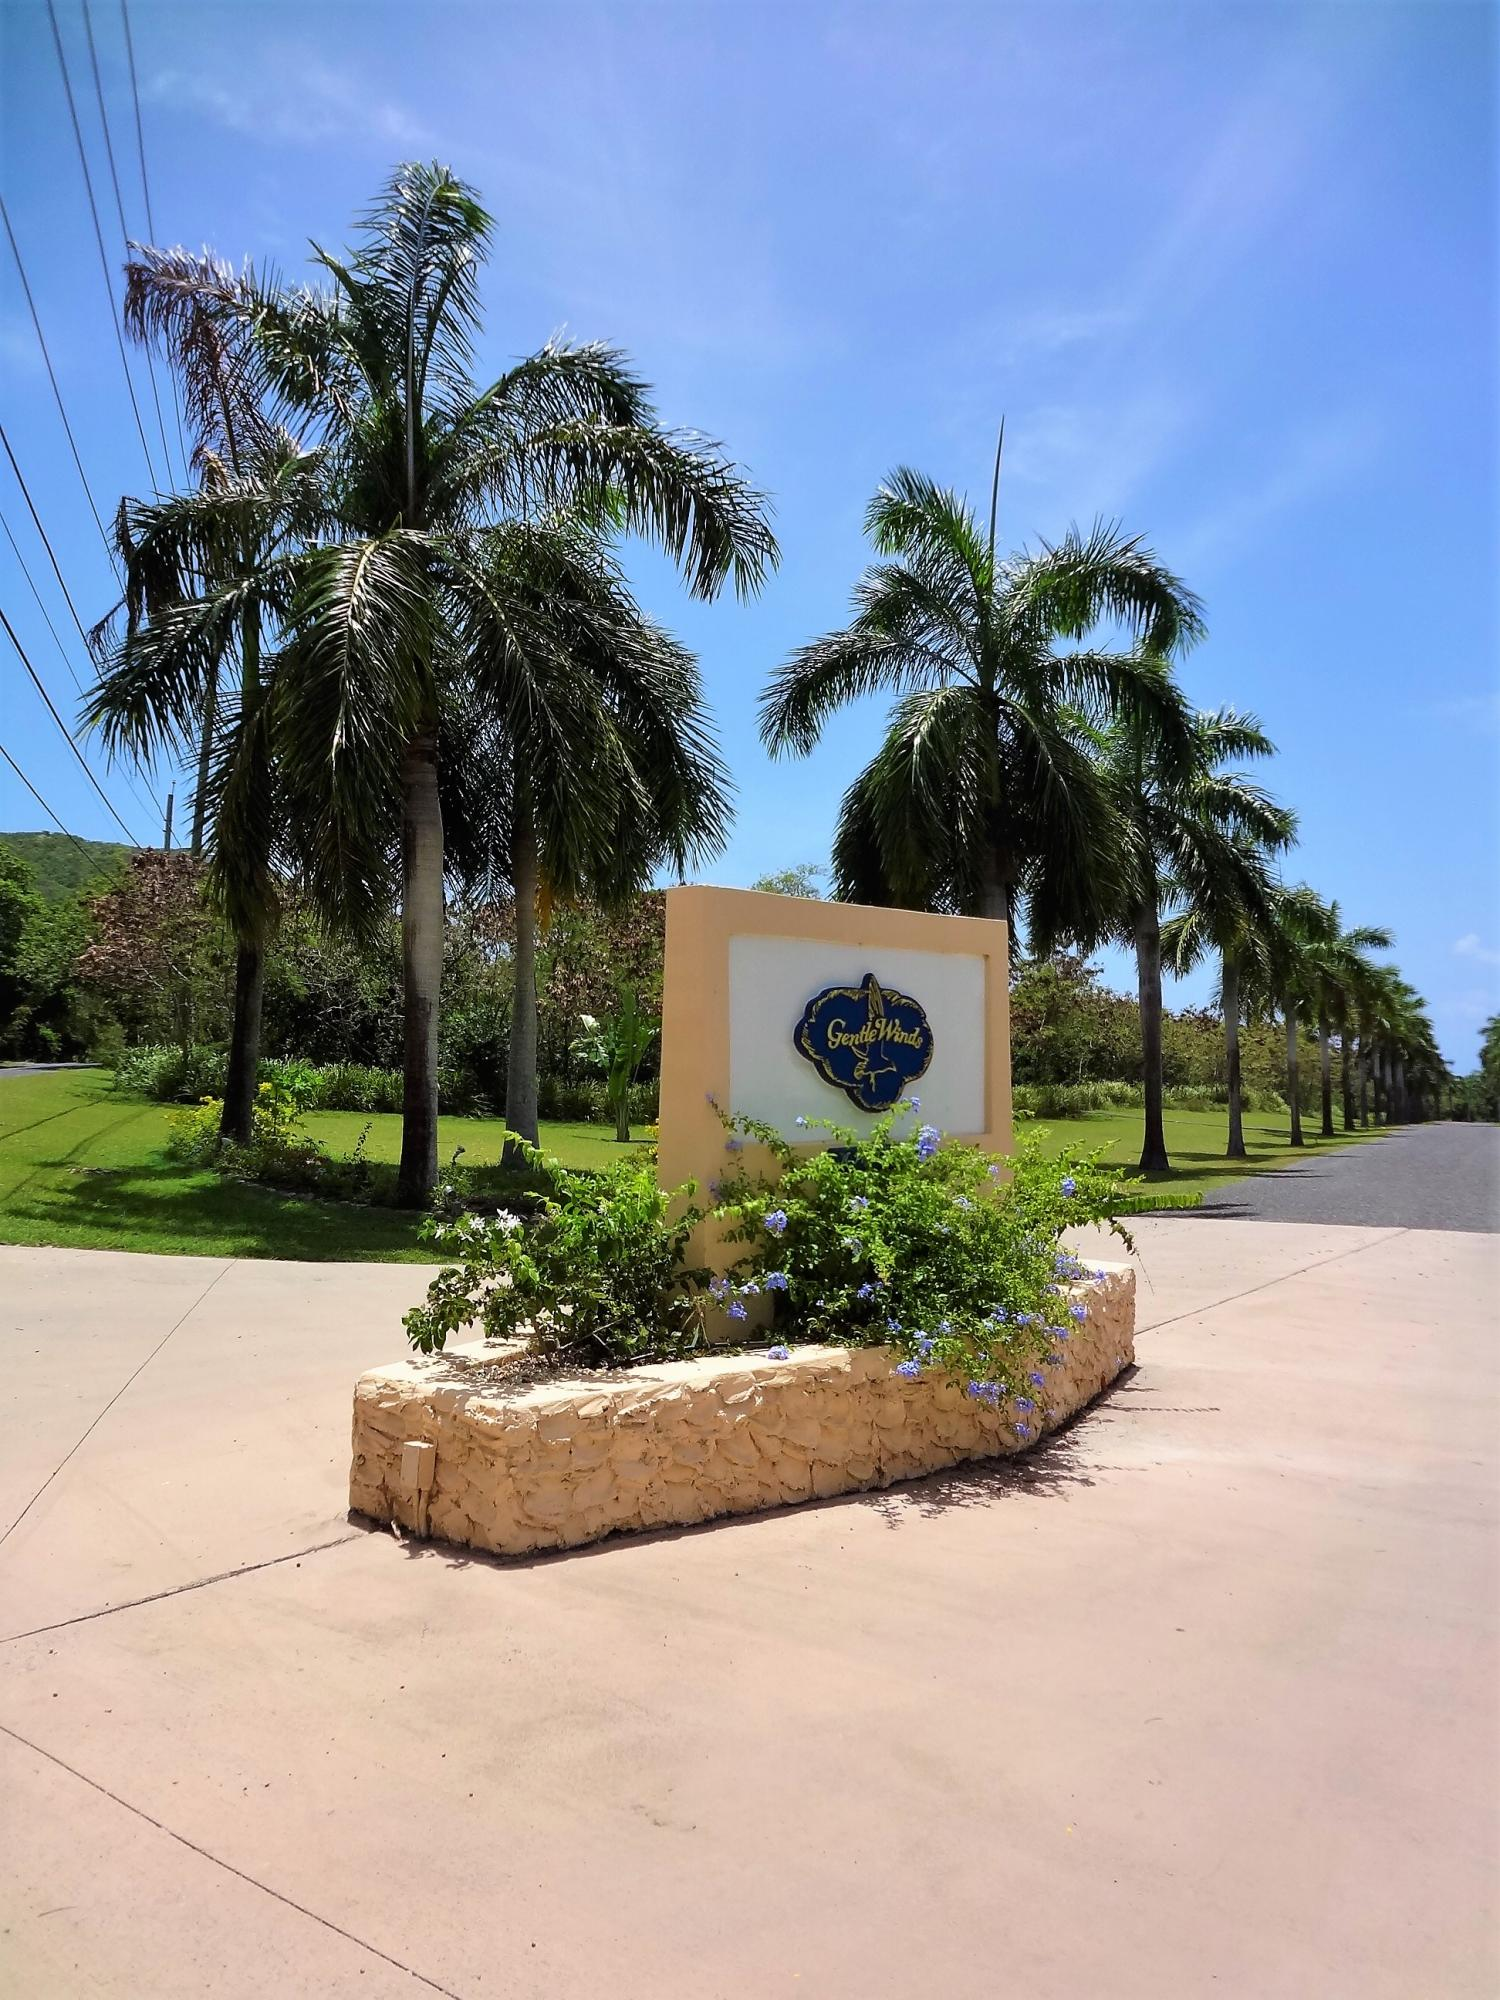 Condominium for Sale at Gentle Winds 6 Salt River NB Gentle Winds 6 Salt River NB St Croix, Virgin Islands 00820 United States Virgin Islands